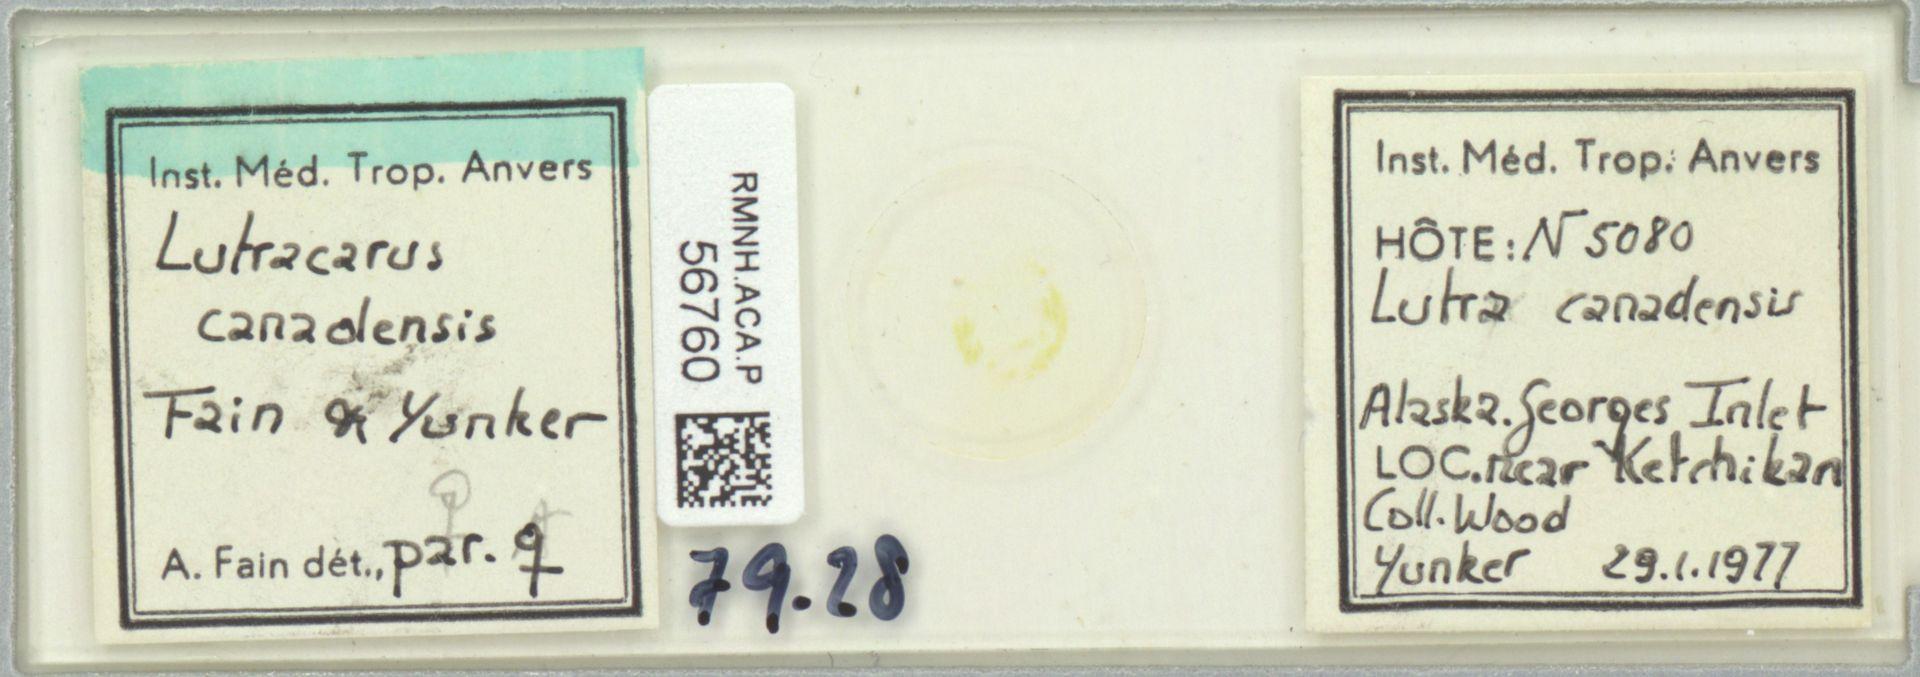 RMNH.ACA.P.56760 | Lutracarus canadensis Fain & Yunker